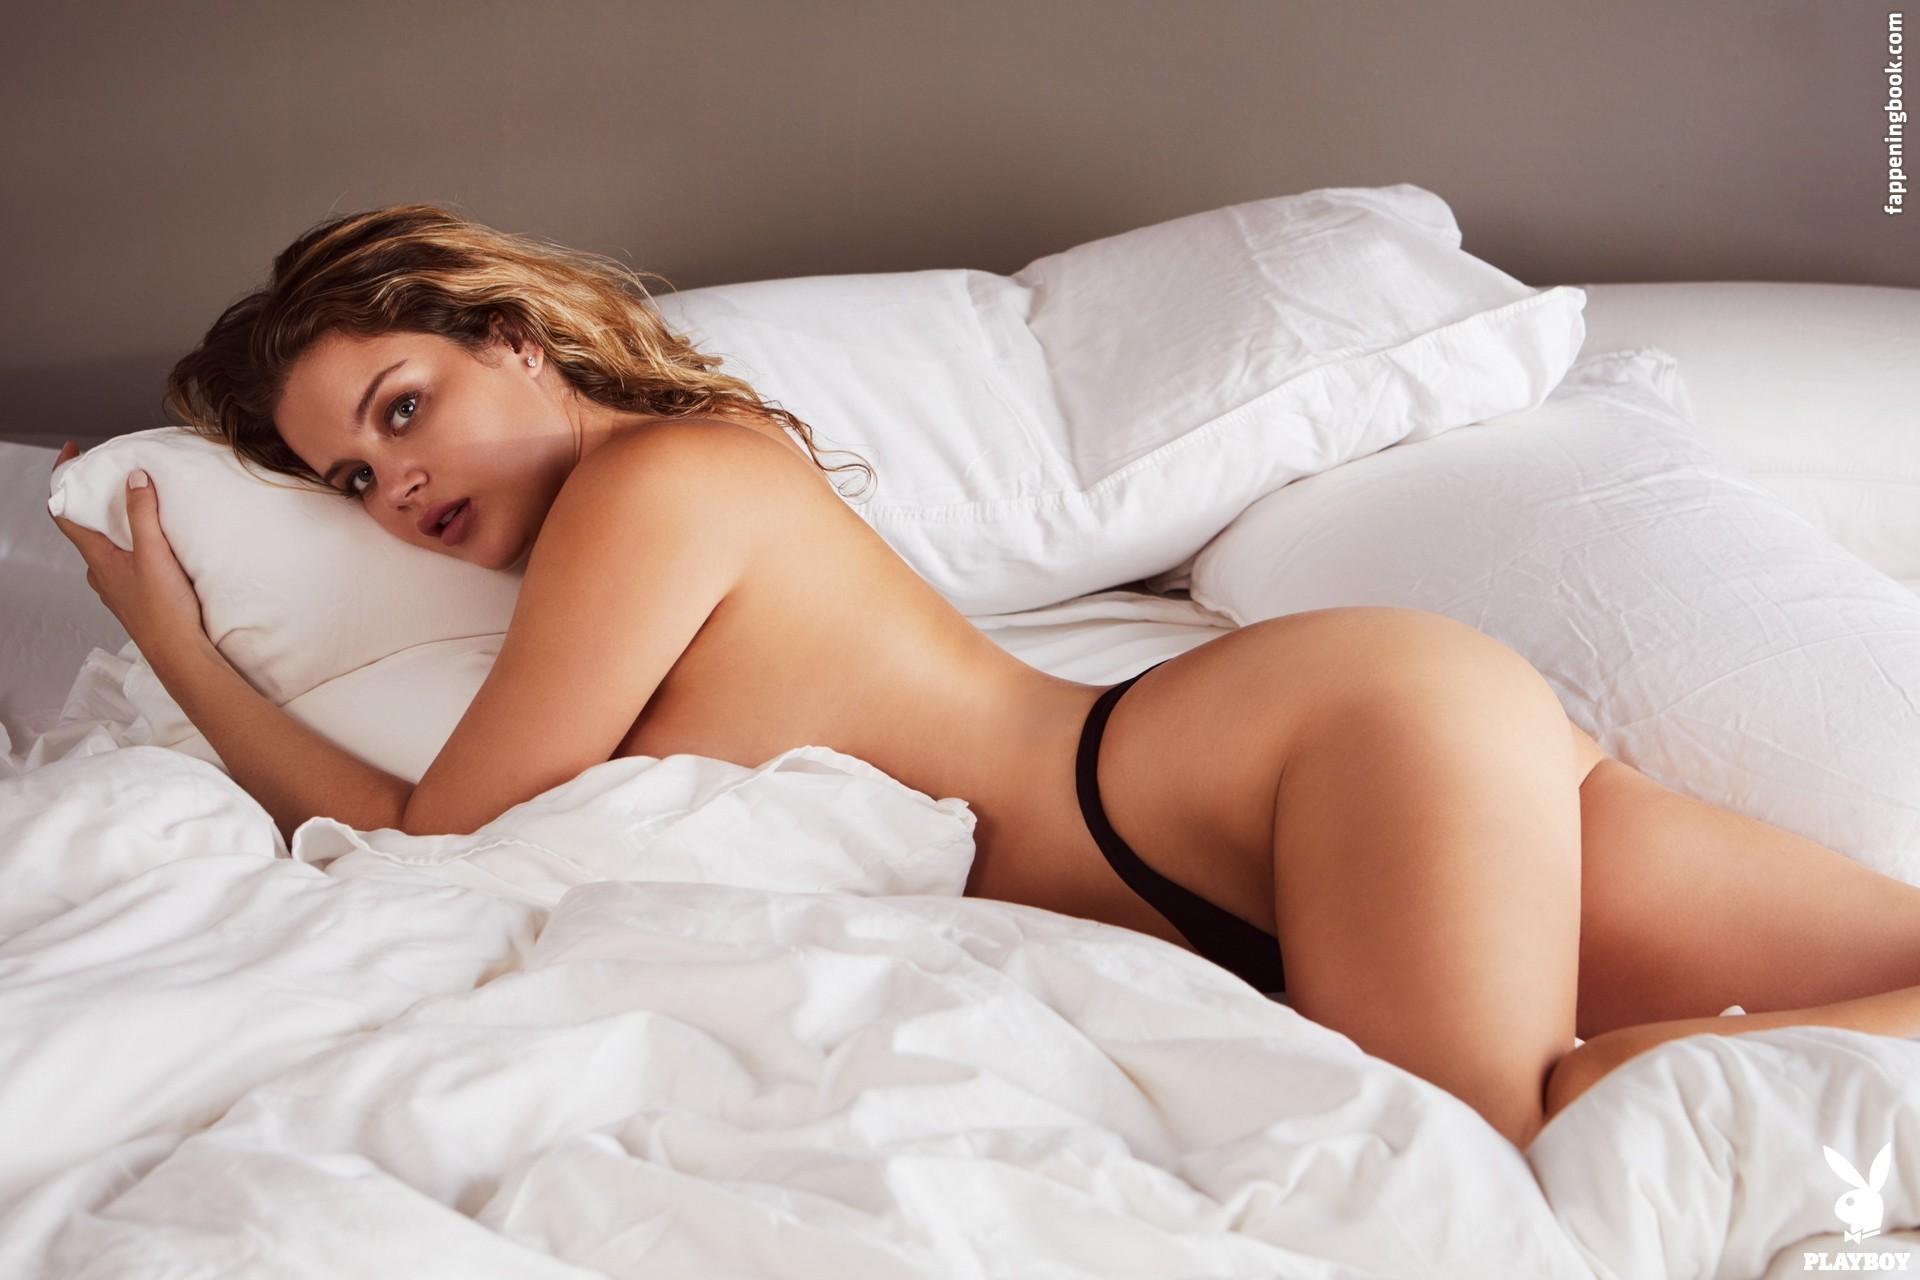 Dorchock nackt Marisa  Marisa Tomei